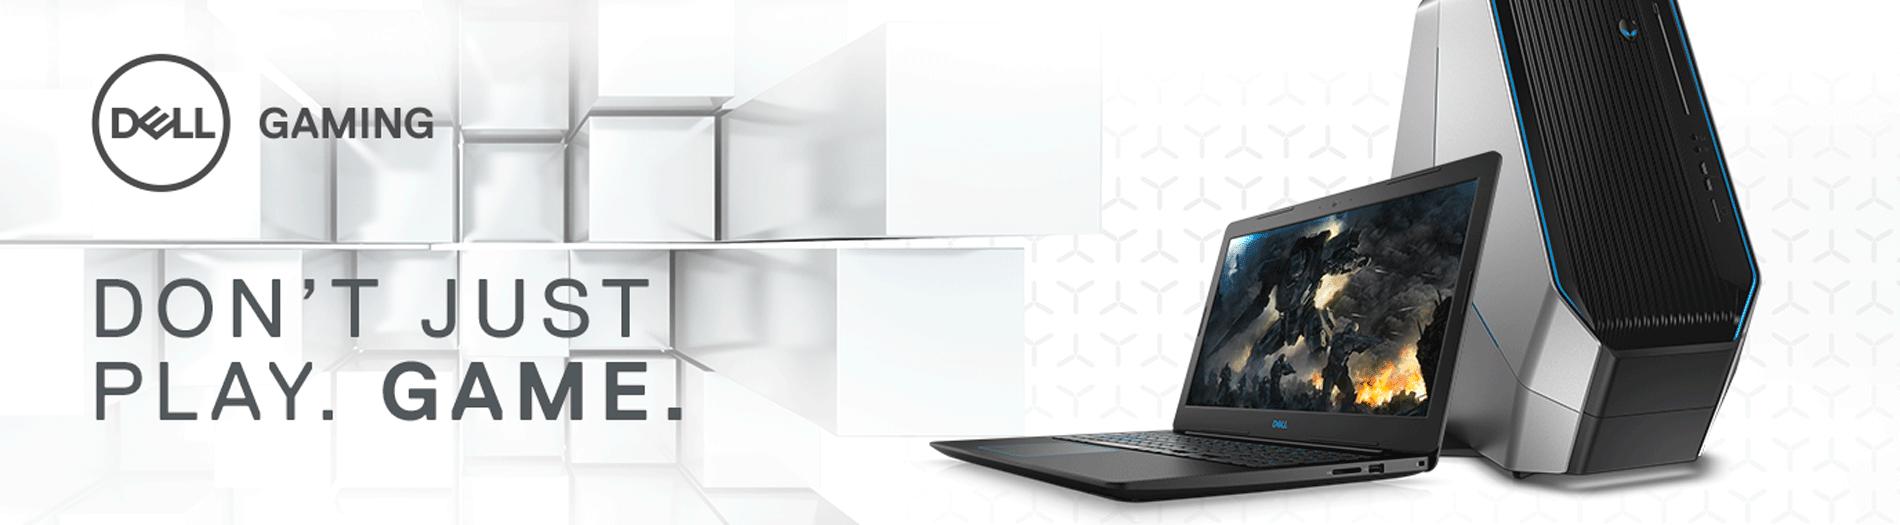 DELL Inspiron Intel® Core™ i3 GTX 1050 Gaming PC - 1 TB HDD